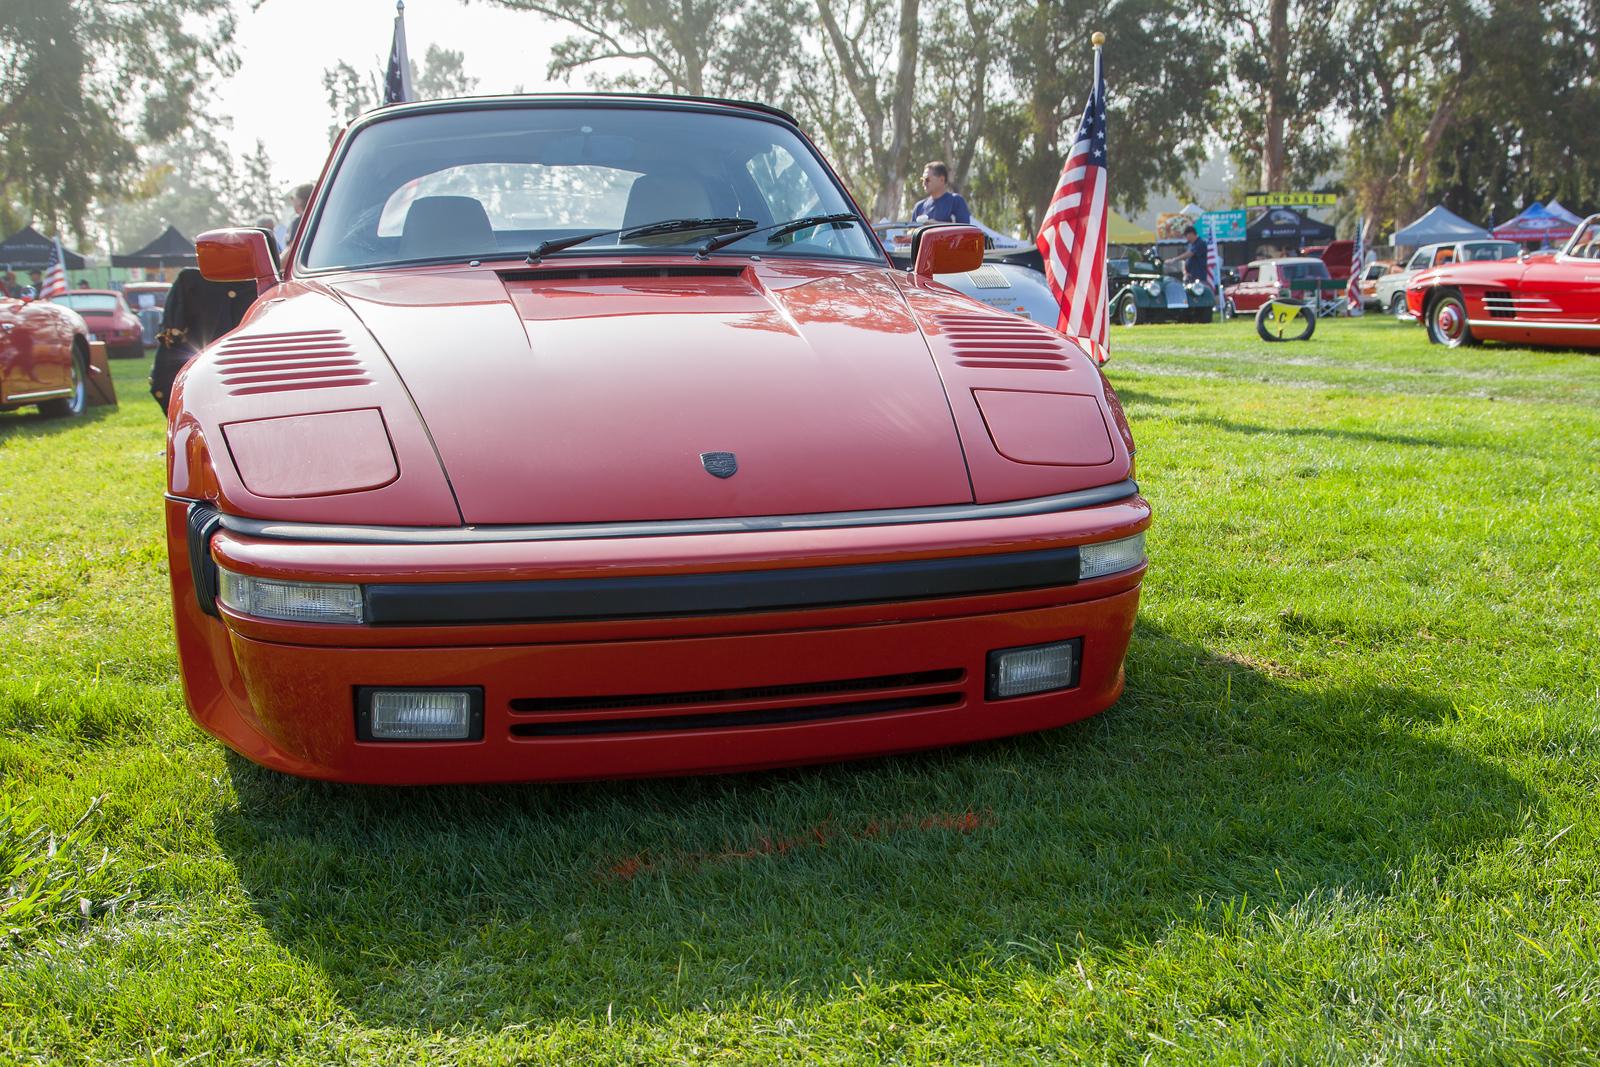 1982 Porsche 911 Slantnose, owned by Bisi Ezerioha